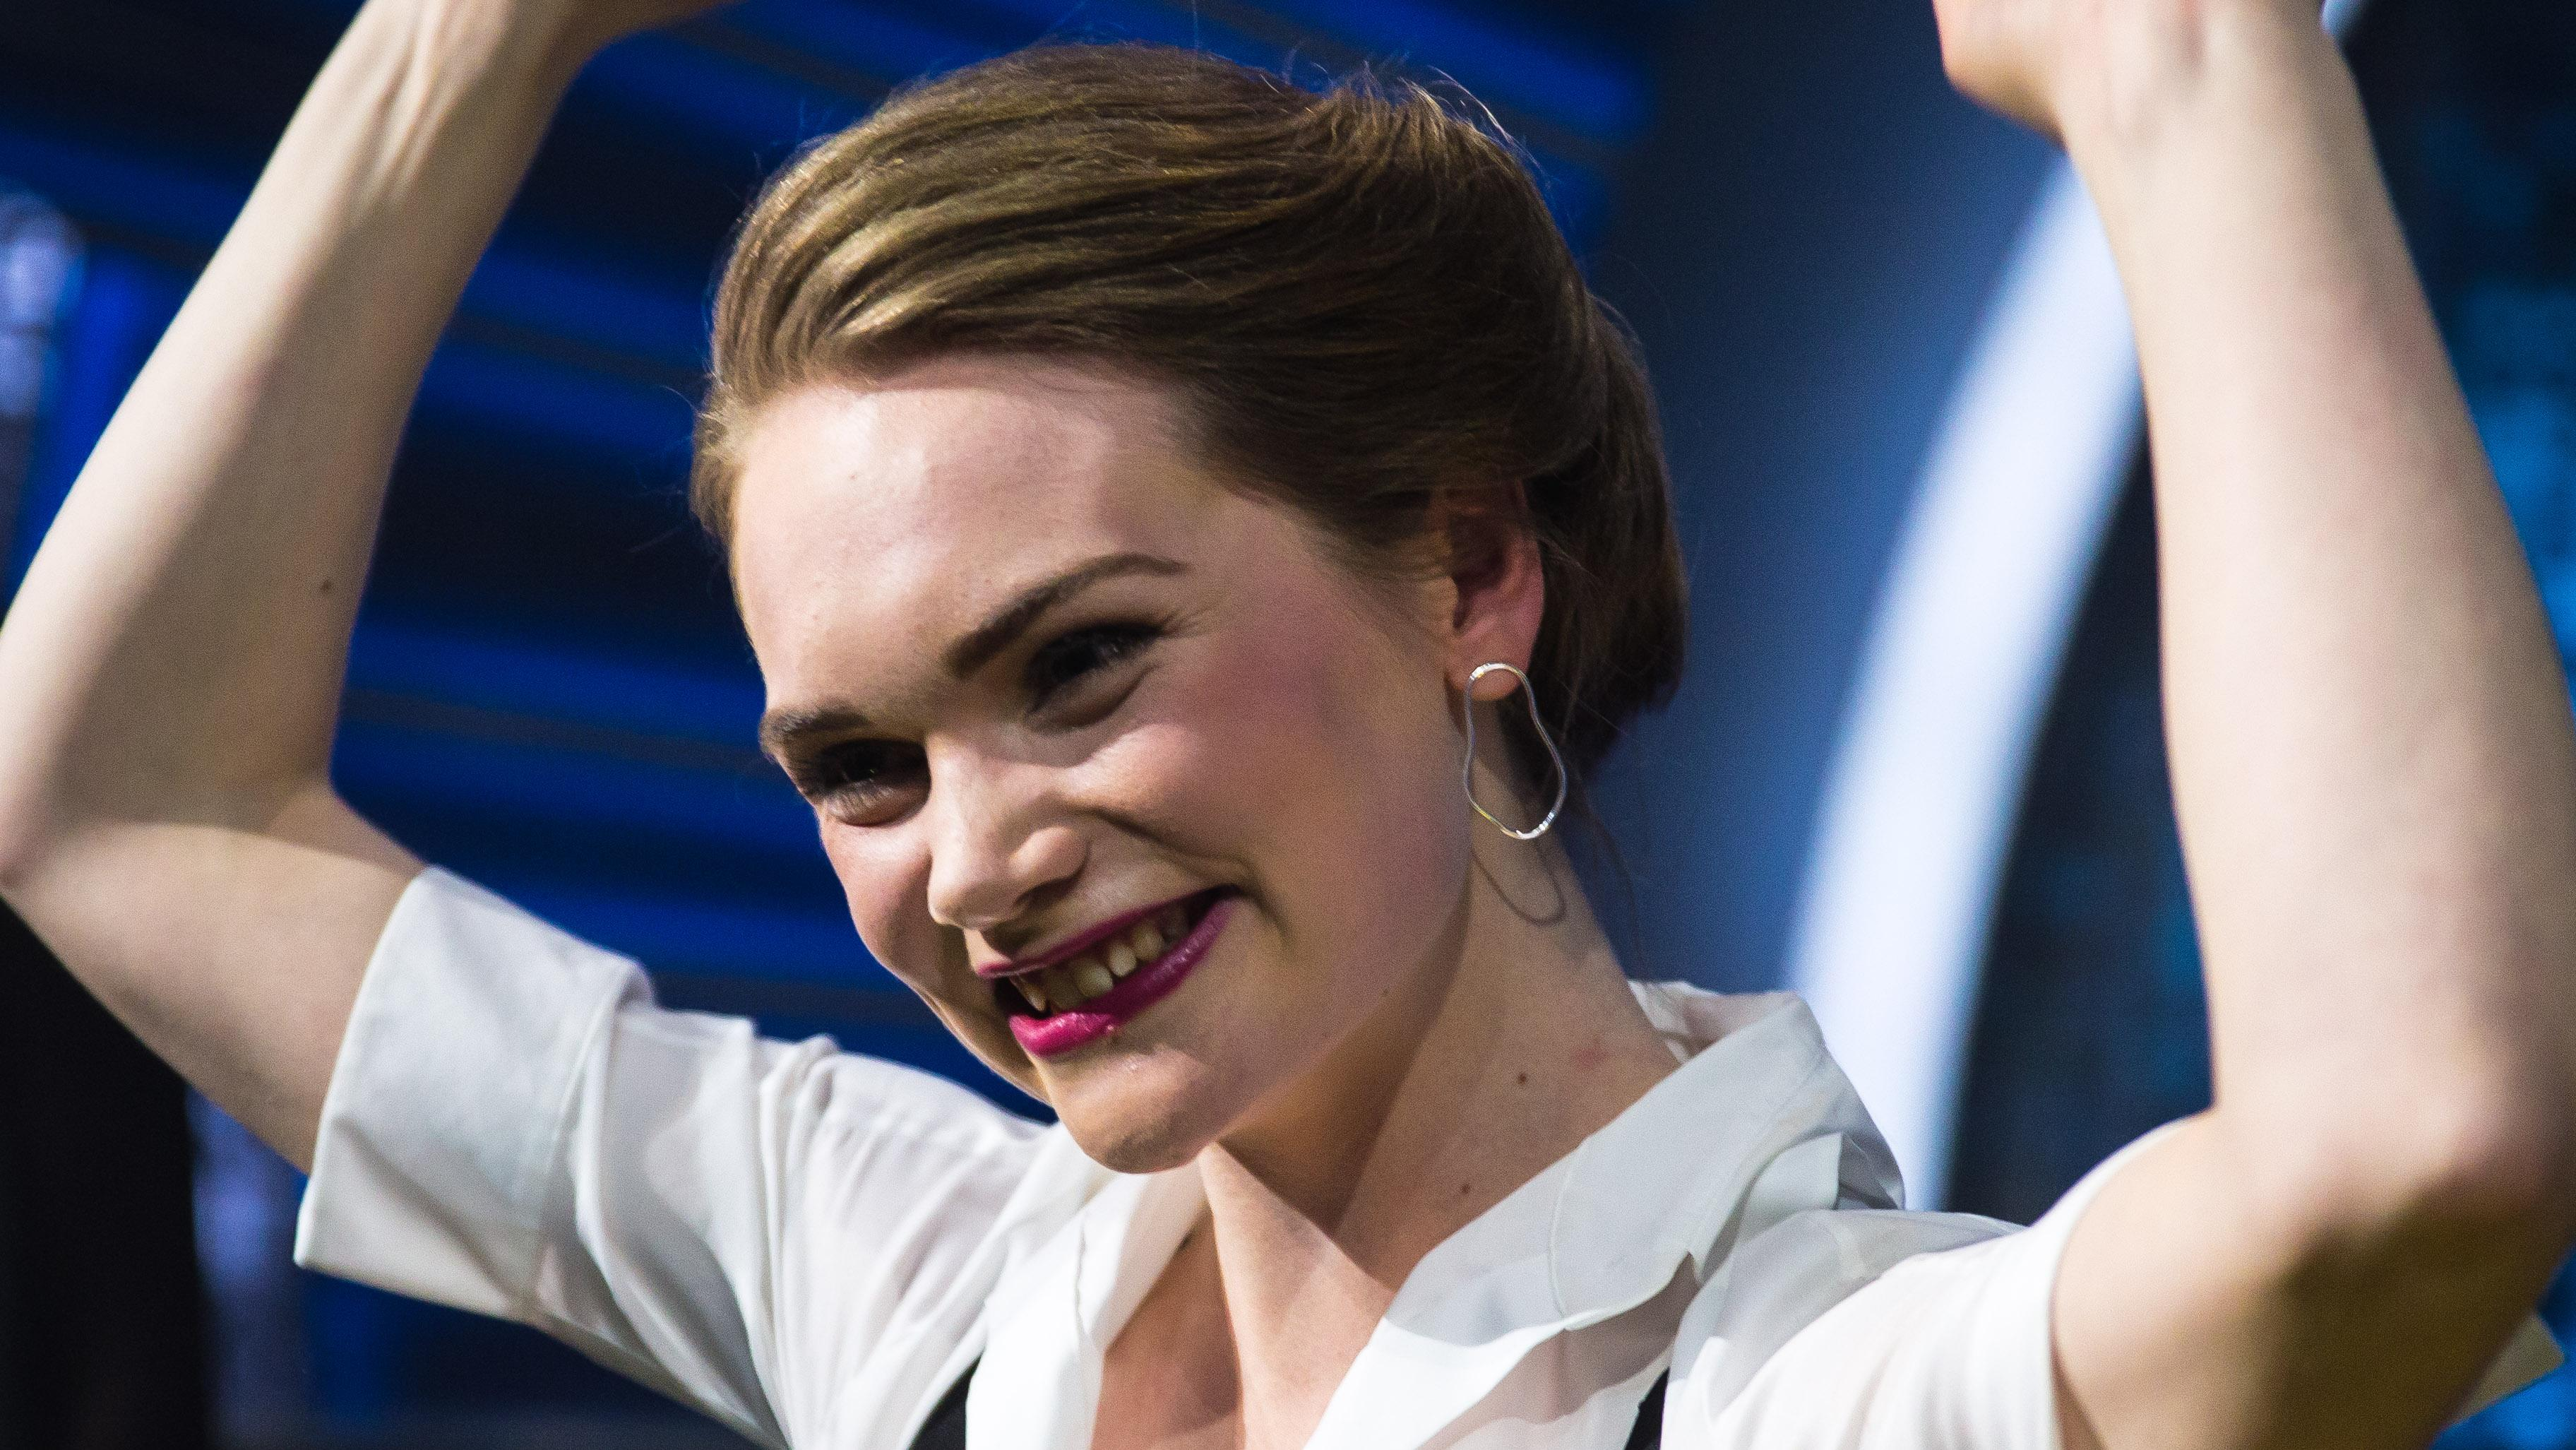 Leonora vinder Dansk Melodi Grand Prix 2019